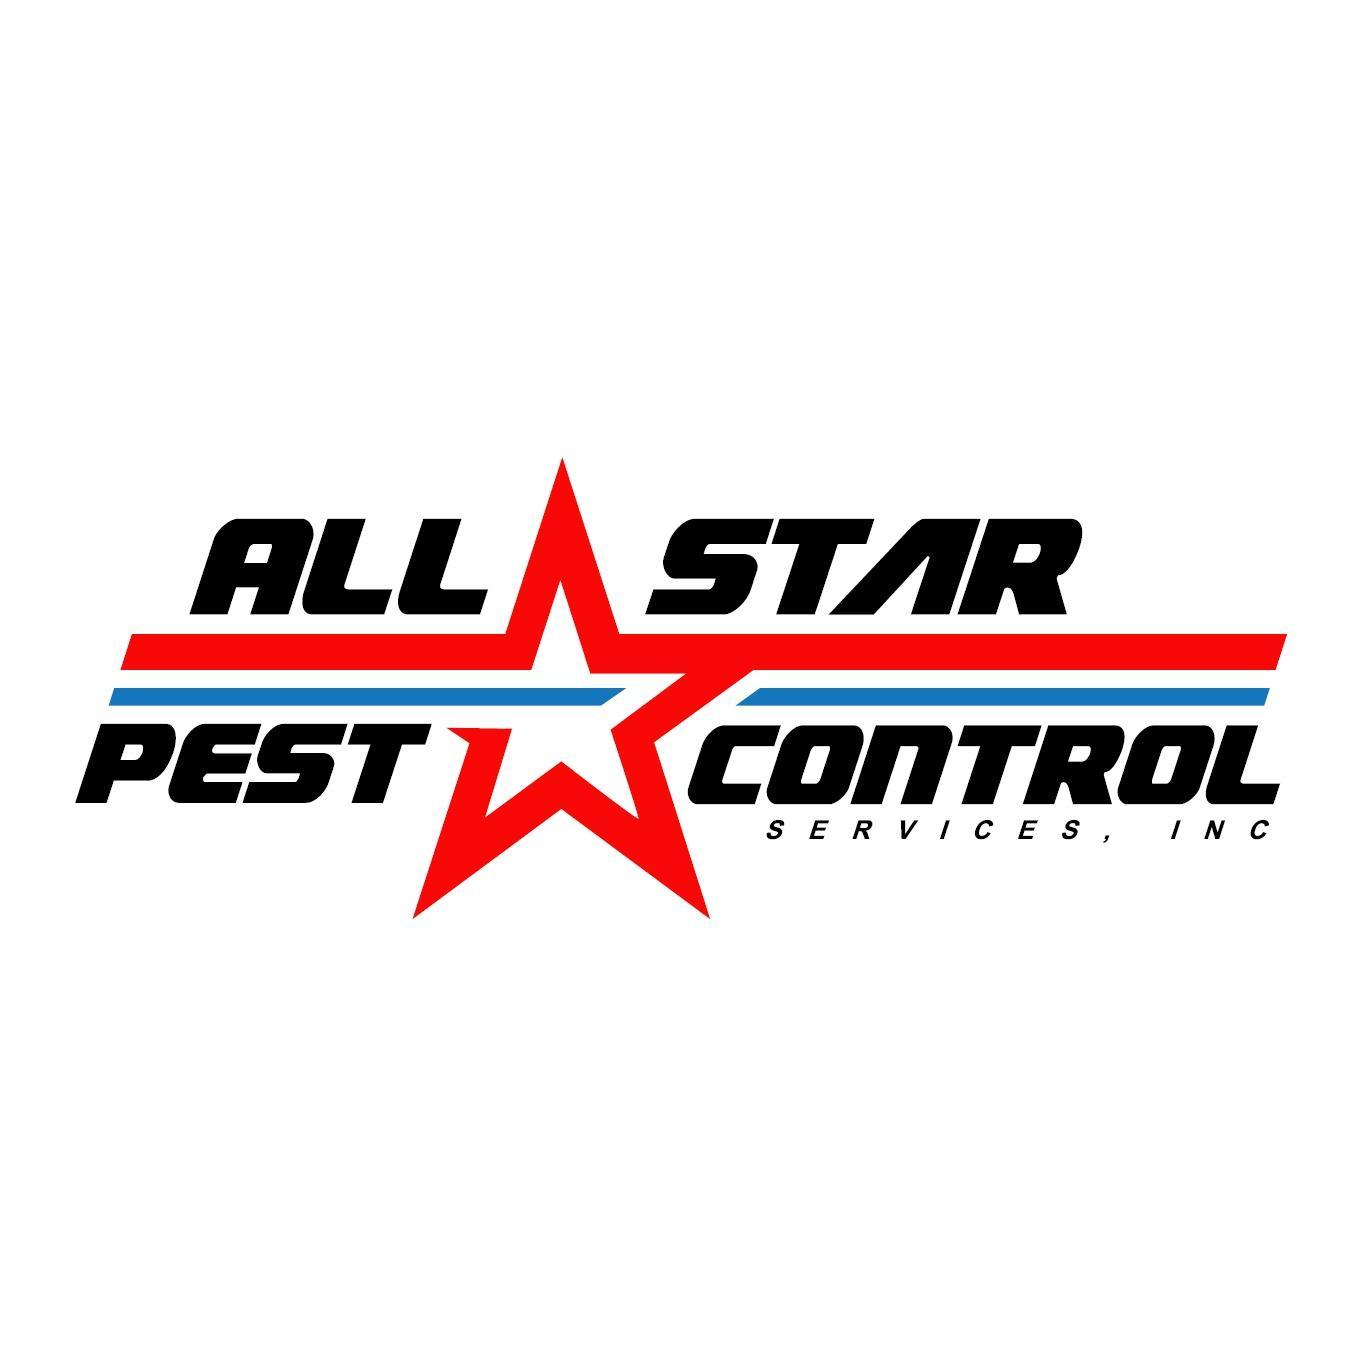 AllStar Pest Control Services